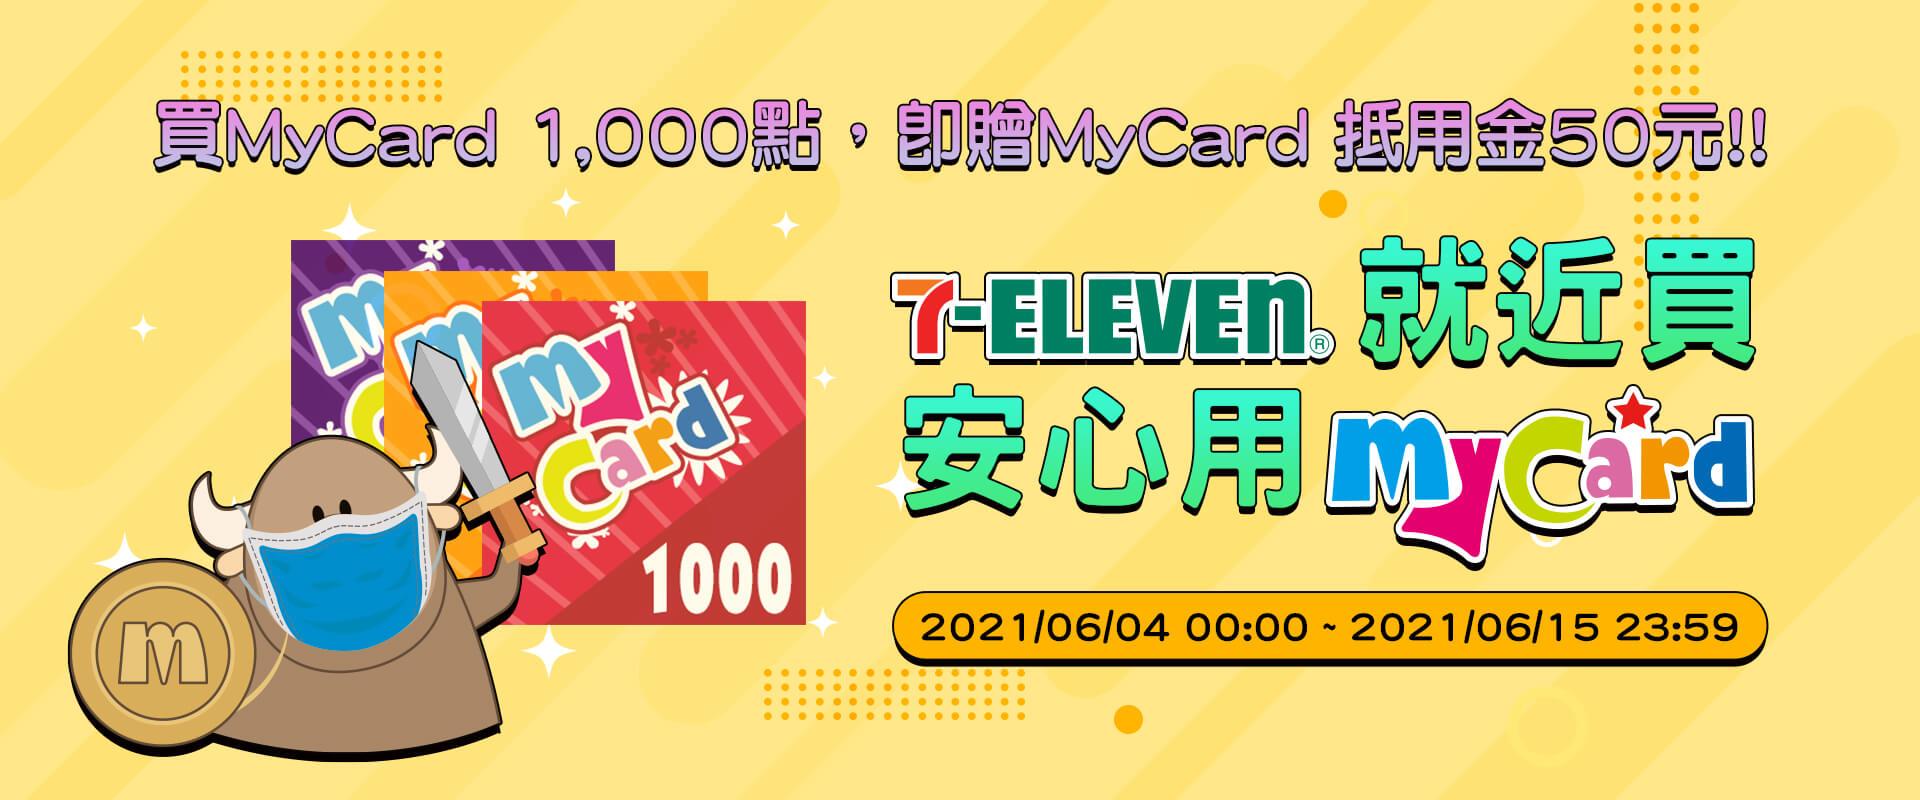 7-ELEVEN就近買安心用MyCard